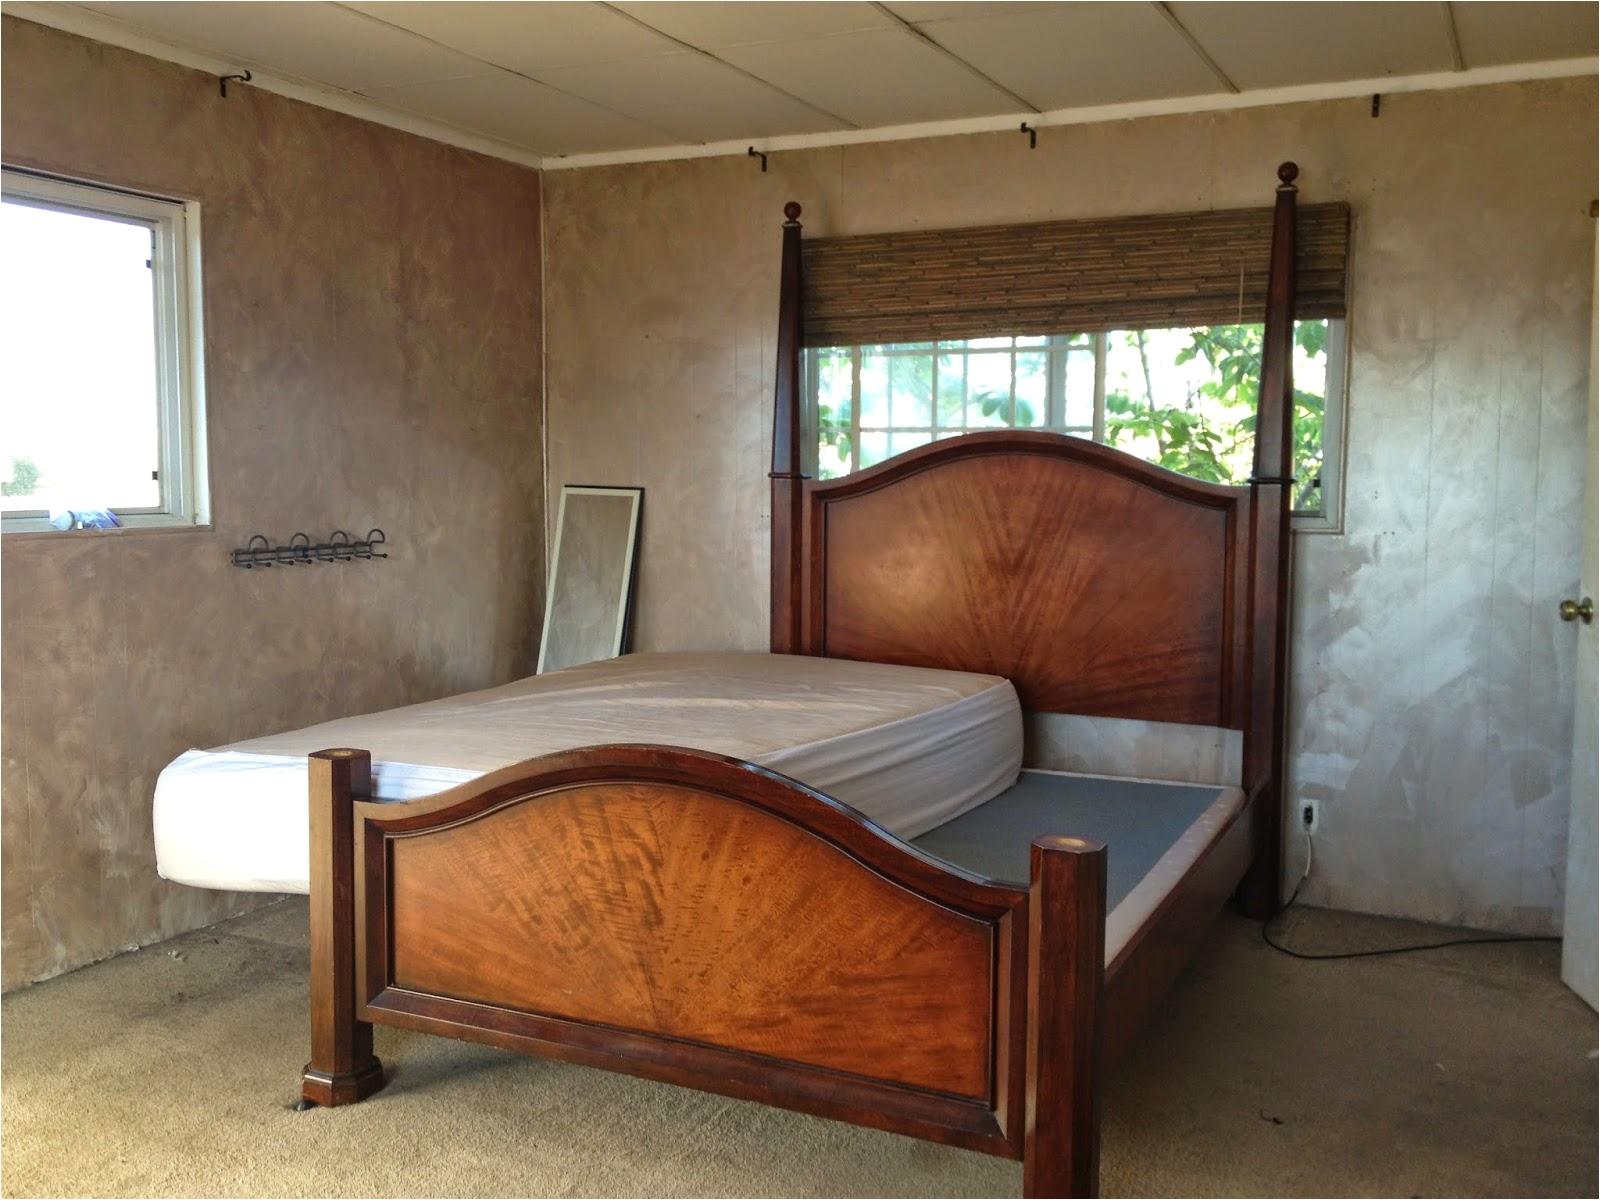 Craigslist Lubbock Tx Furniture - Photos Wallpaper Clikimage Co